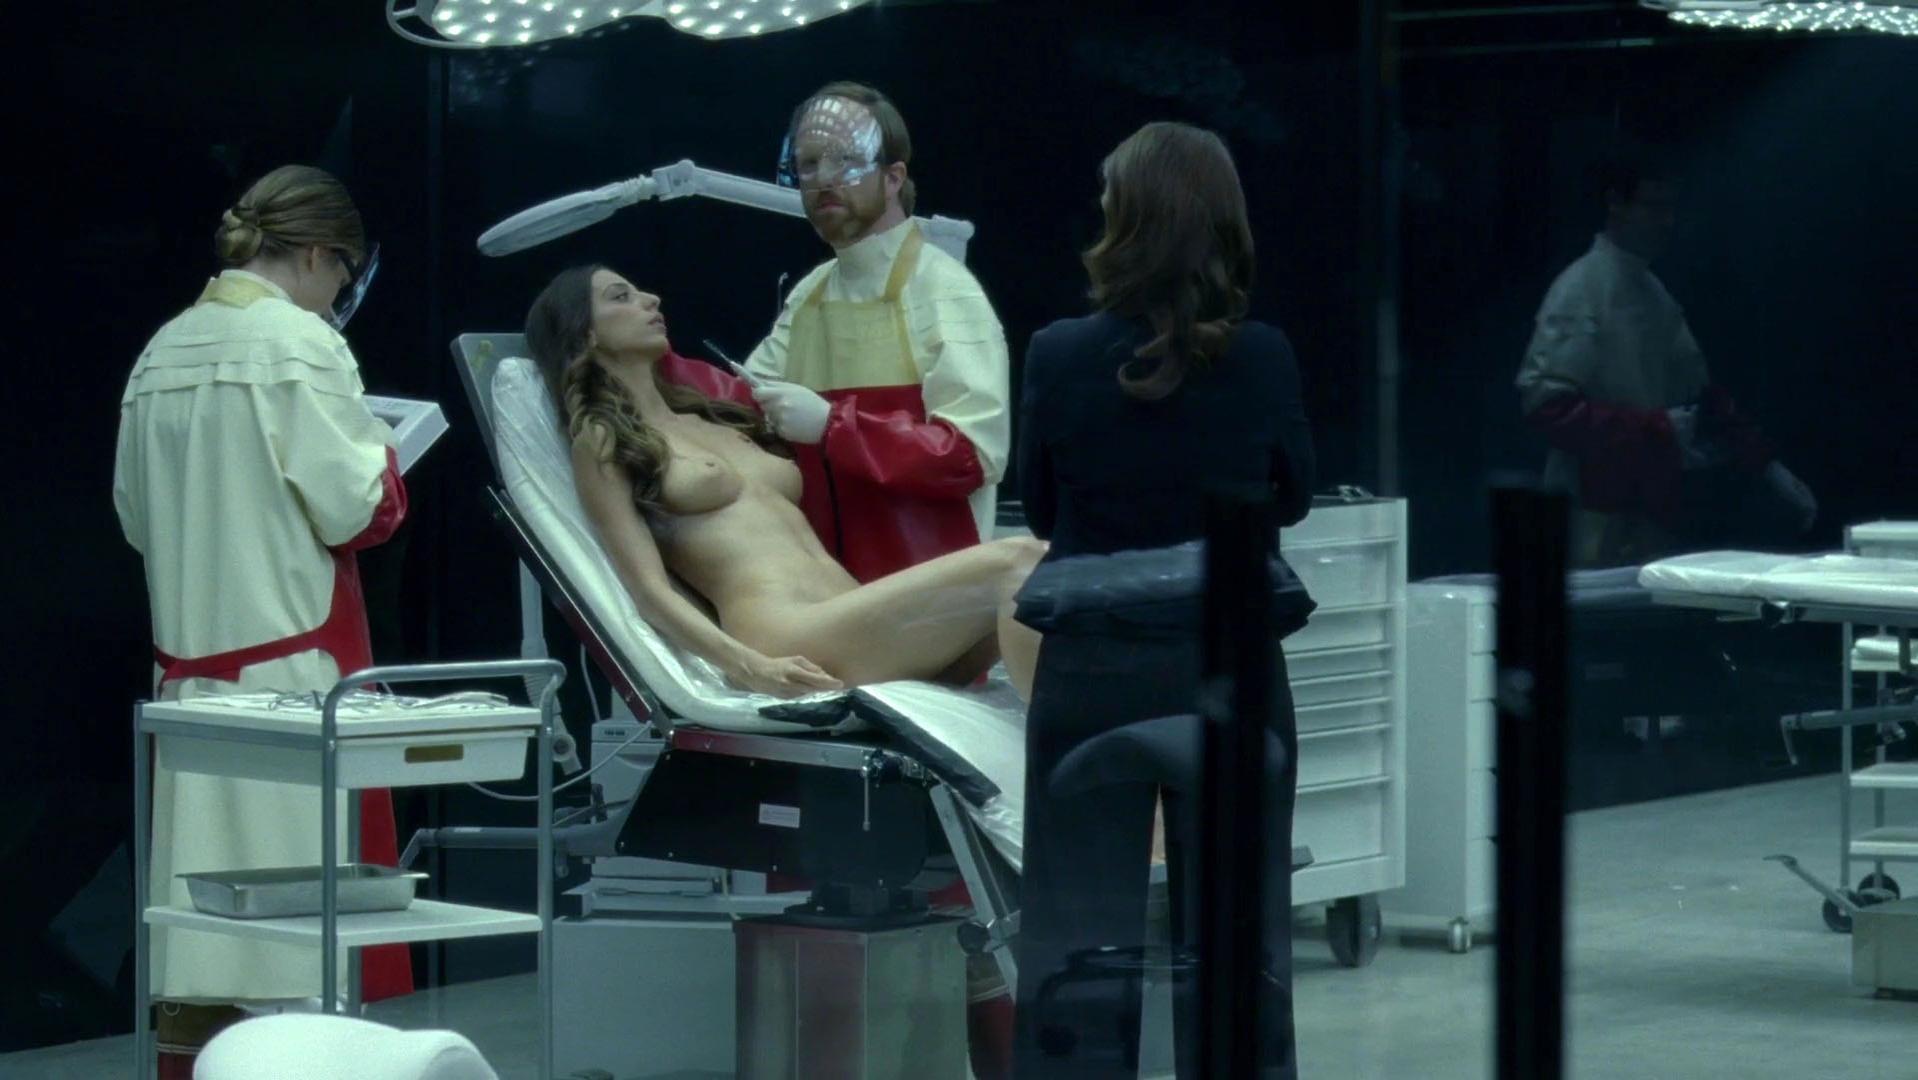 Angela Sarafyan nude - Westworld s01e07 (2016)